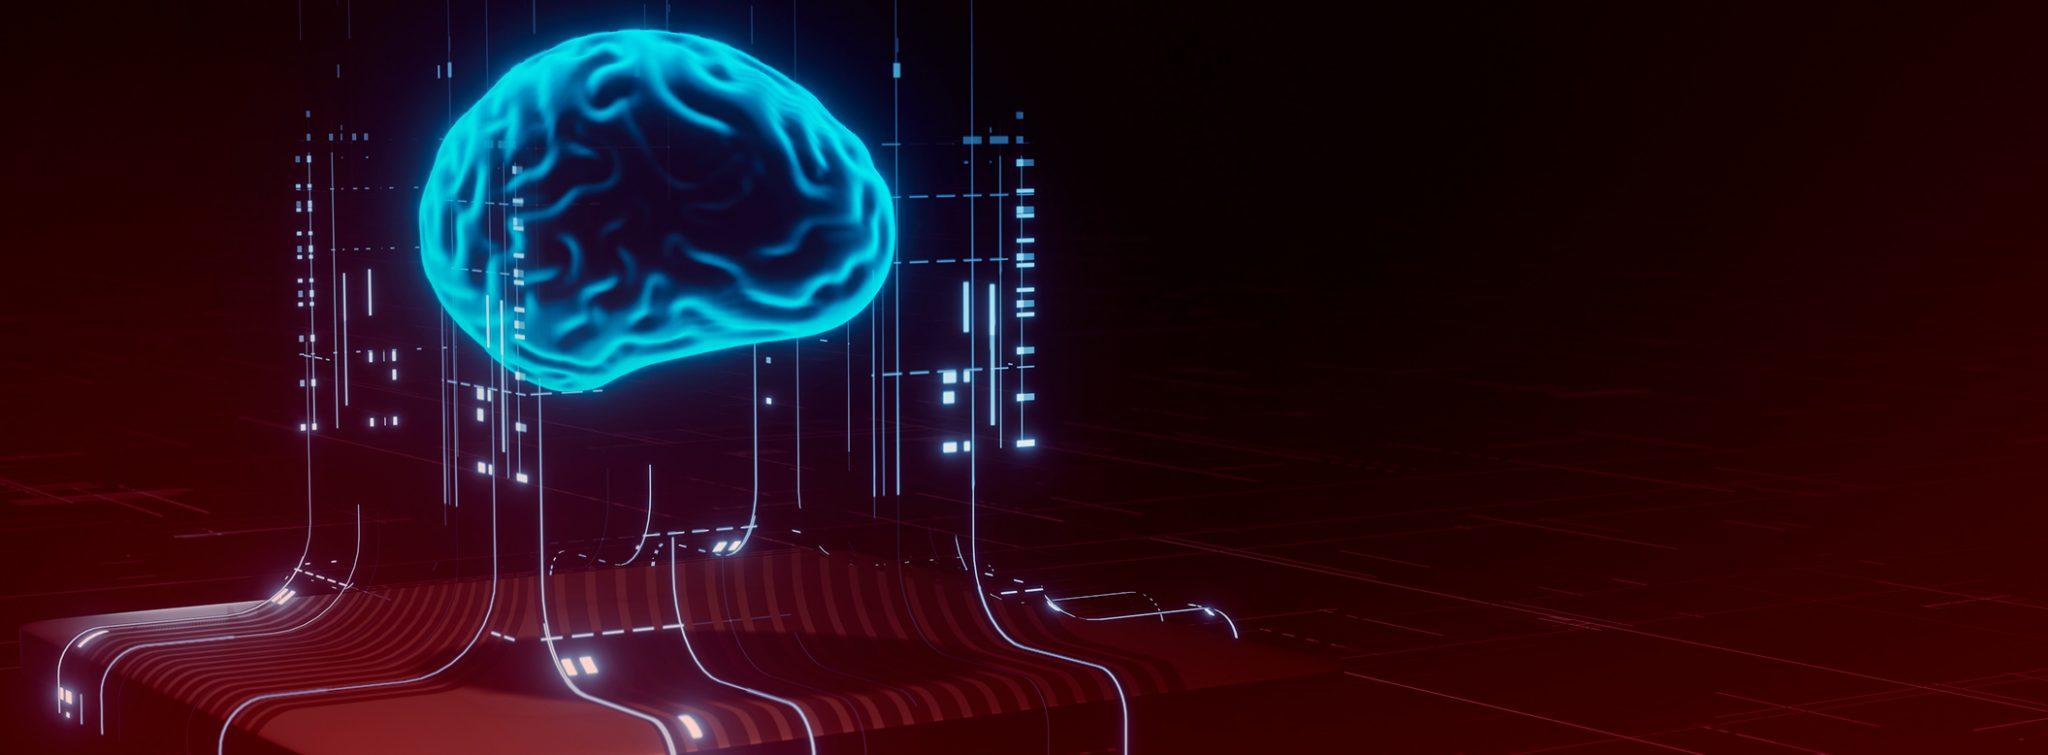 Scheduling e Inteligência Artificial: cases de sucesso